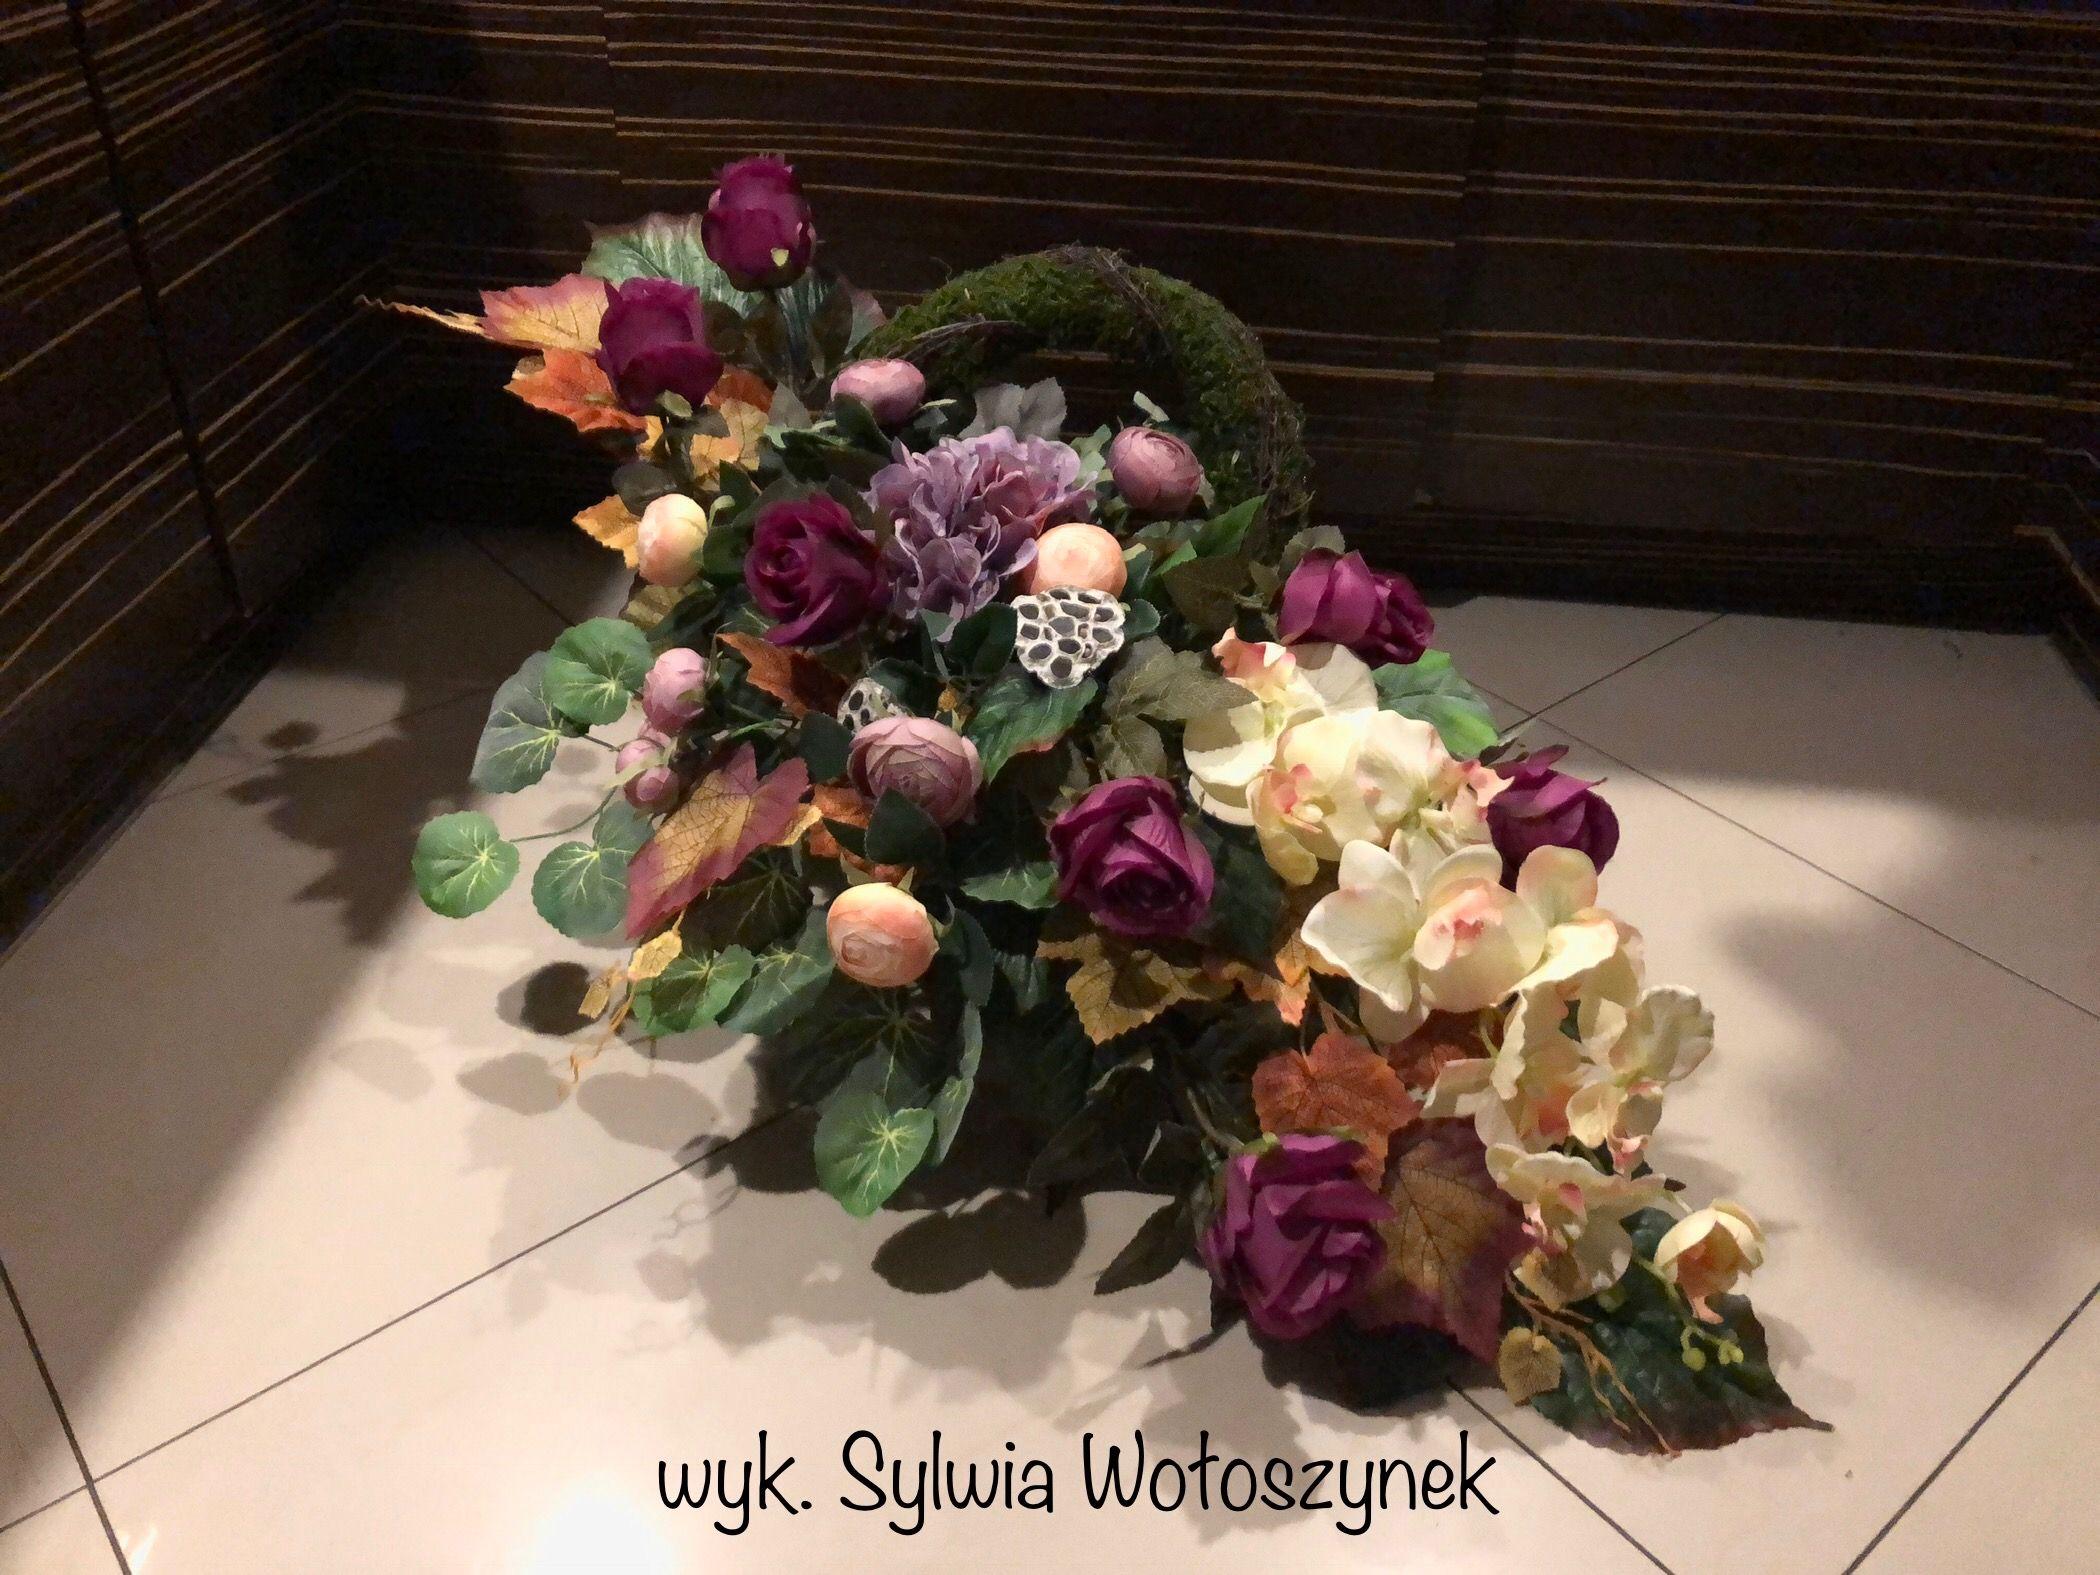 Kompozycja Nagrobna 2018 Wyk Sylwia Woloszynek Floral Arrangements Floral Floral Wreath